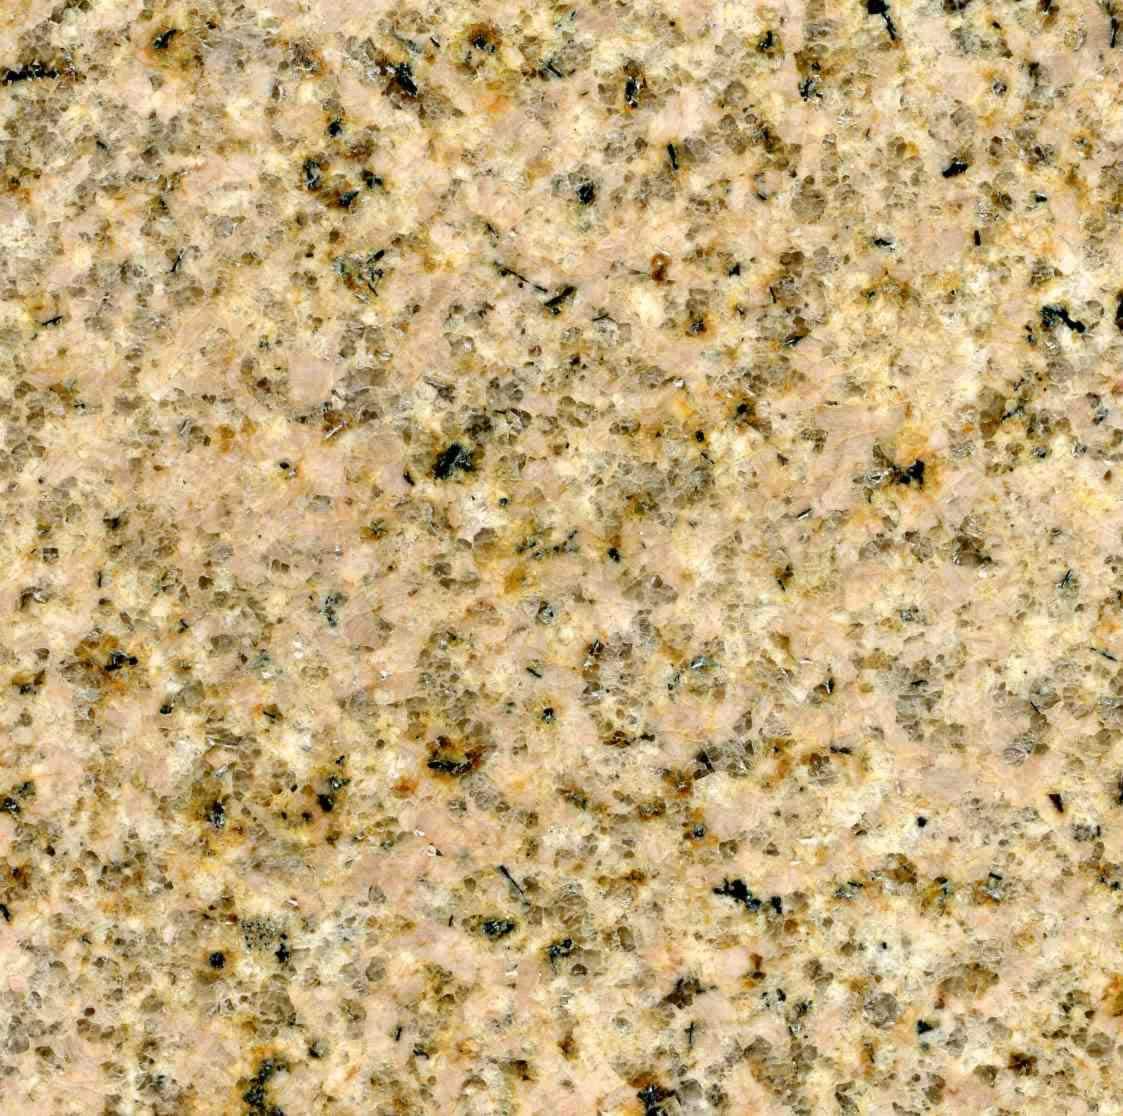 G682 300x600xt20 for Granito color beige